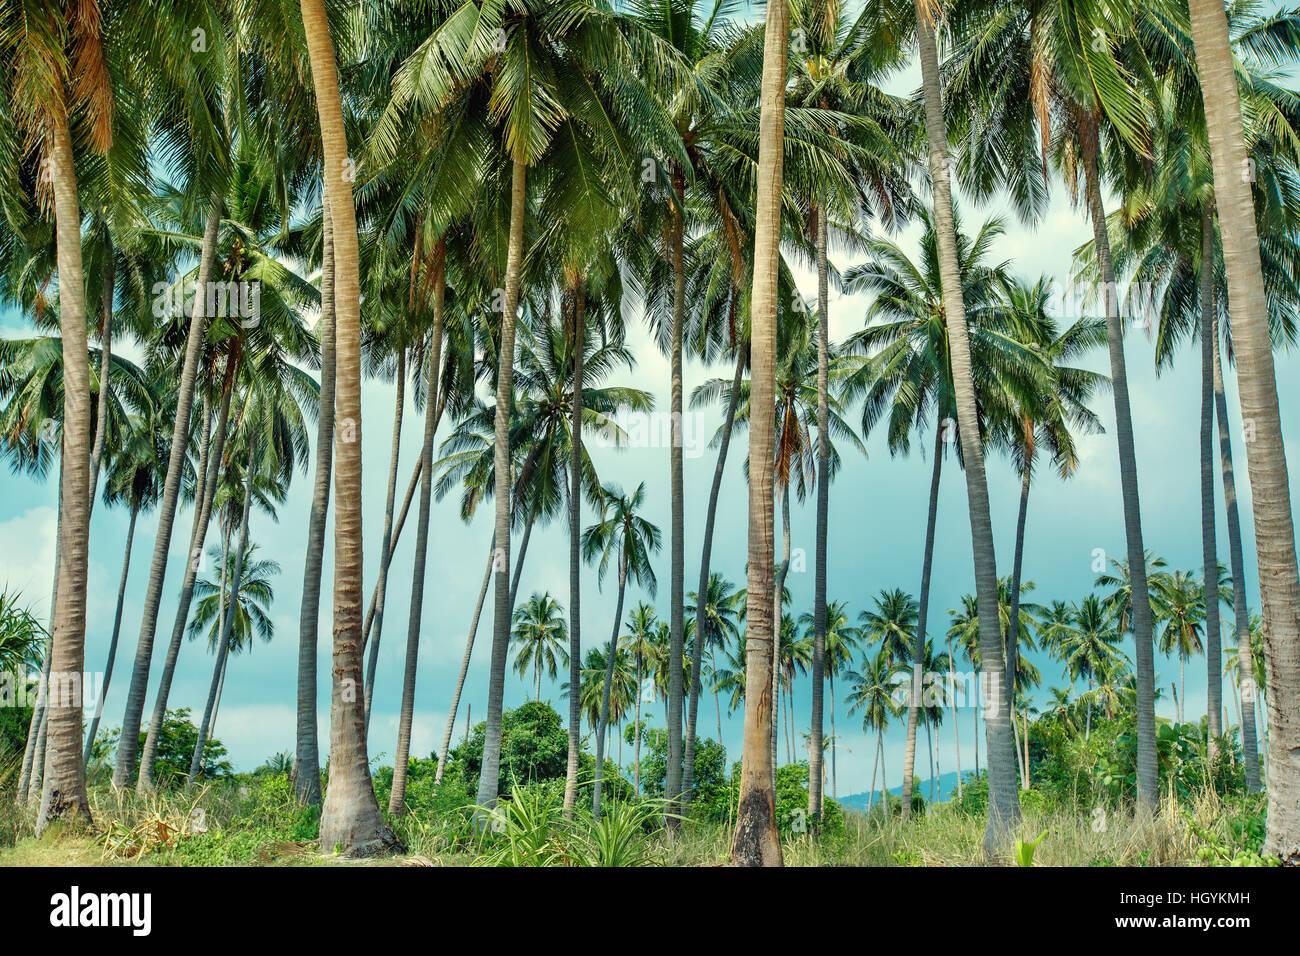 Kokospalmen am tropischen Strand in Koh Samui, Thailand Stockbild